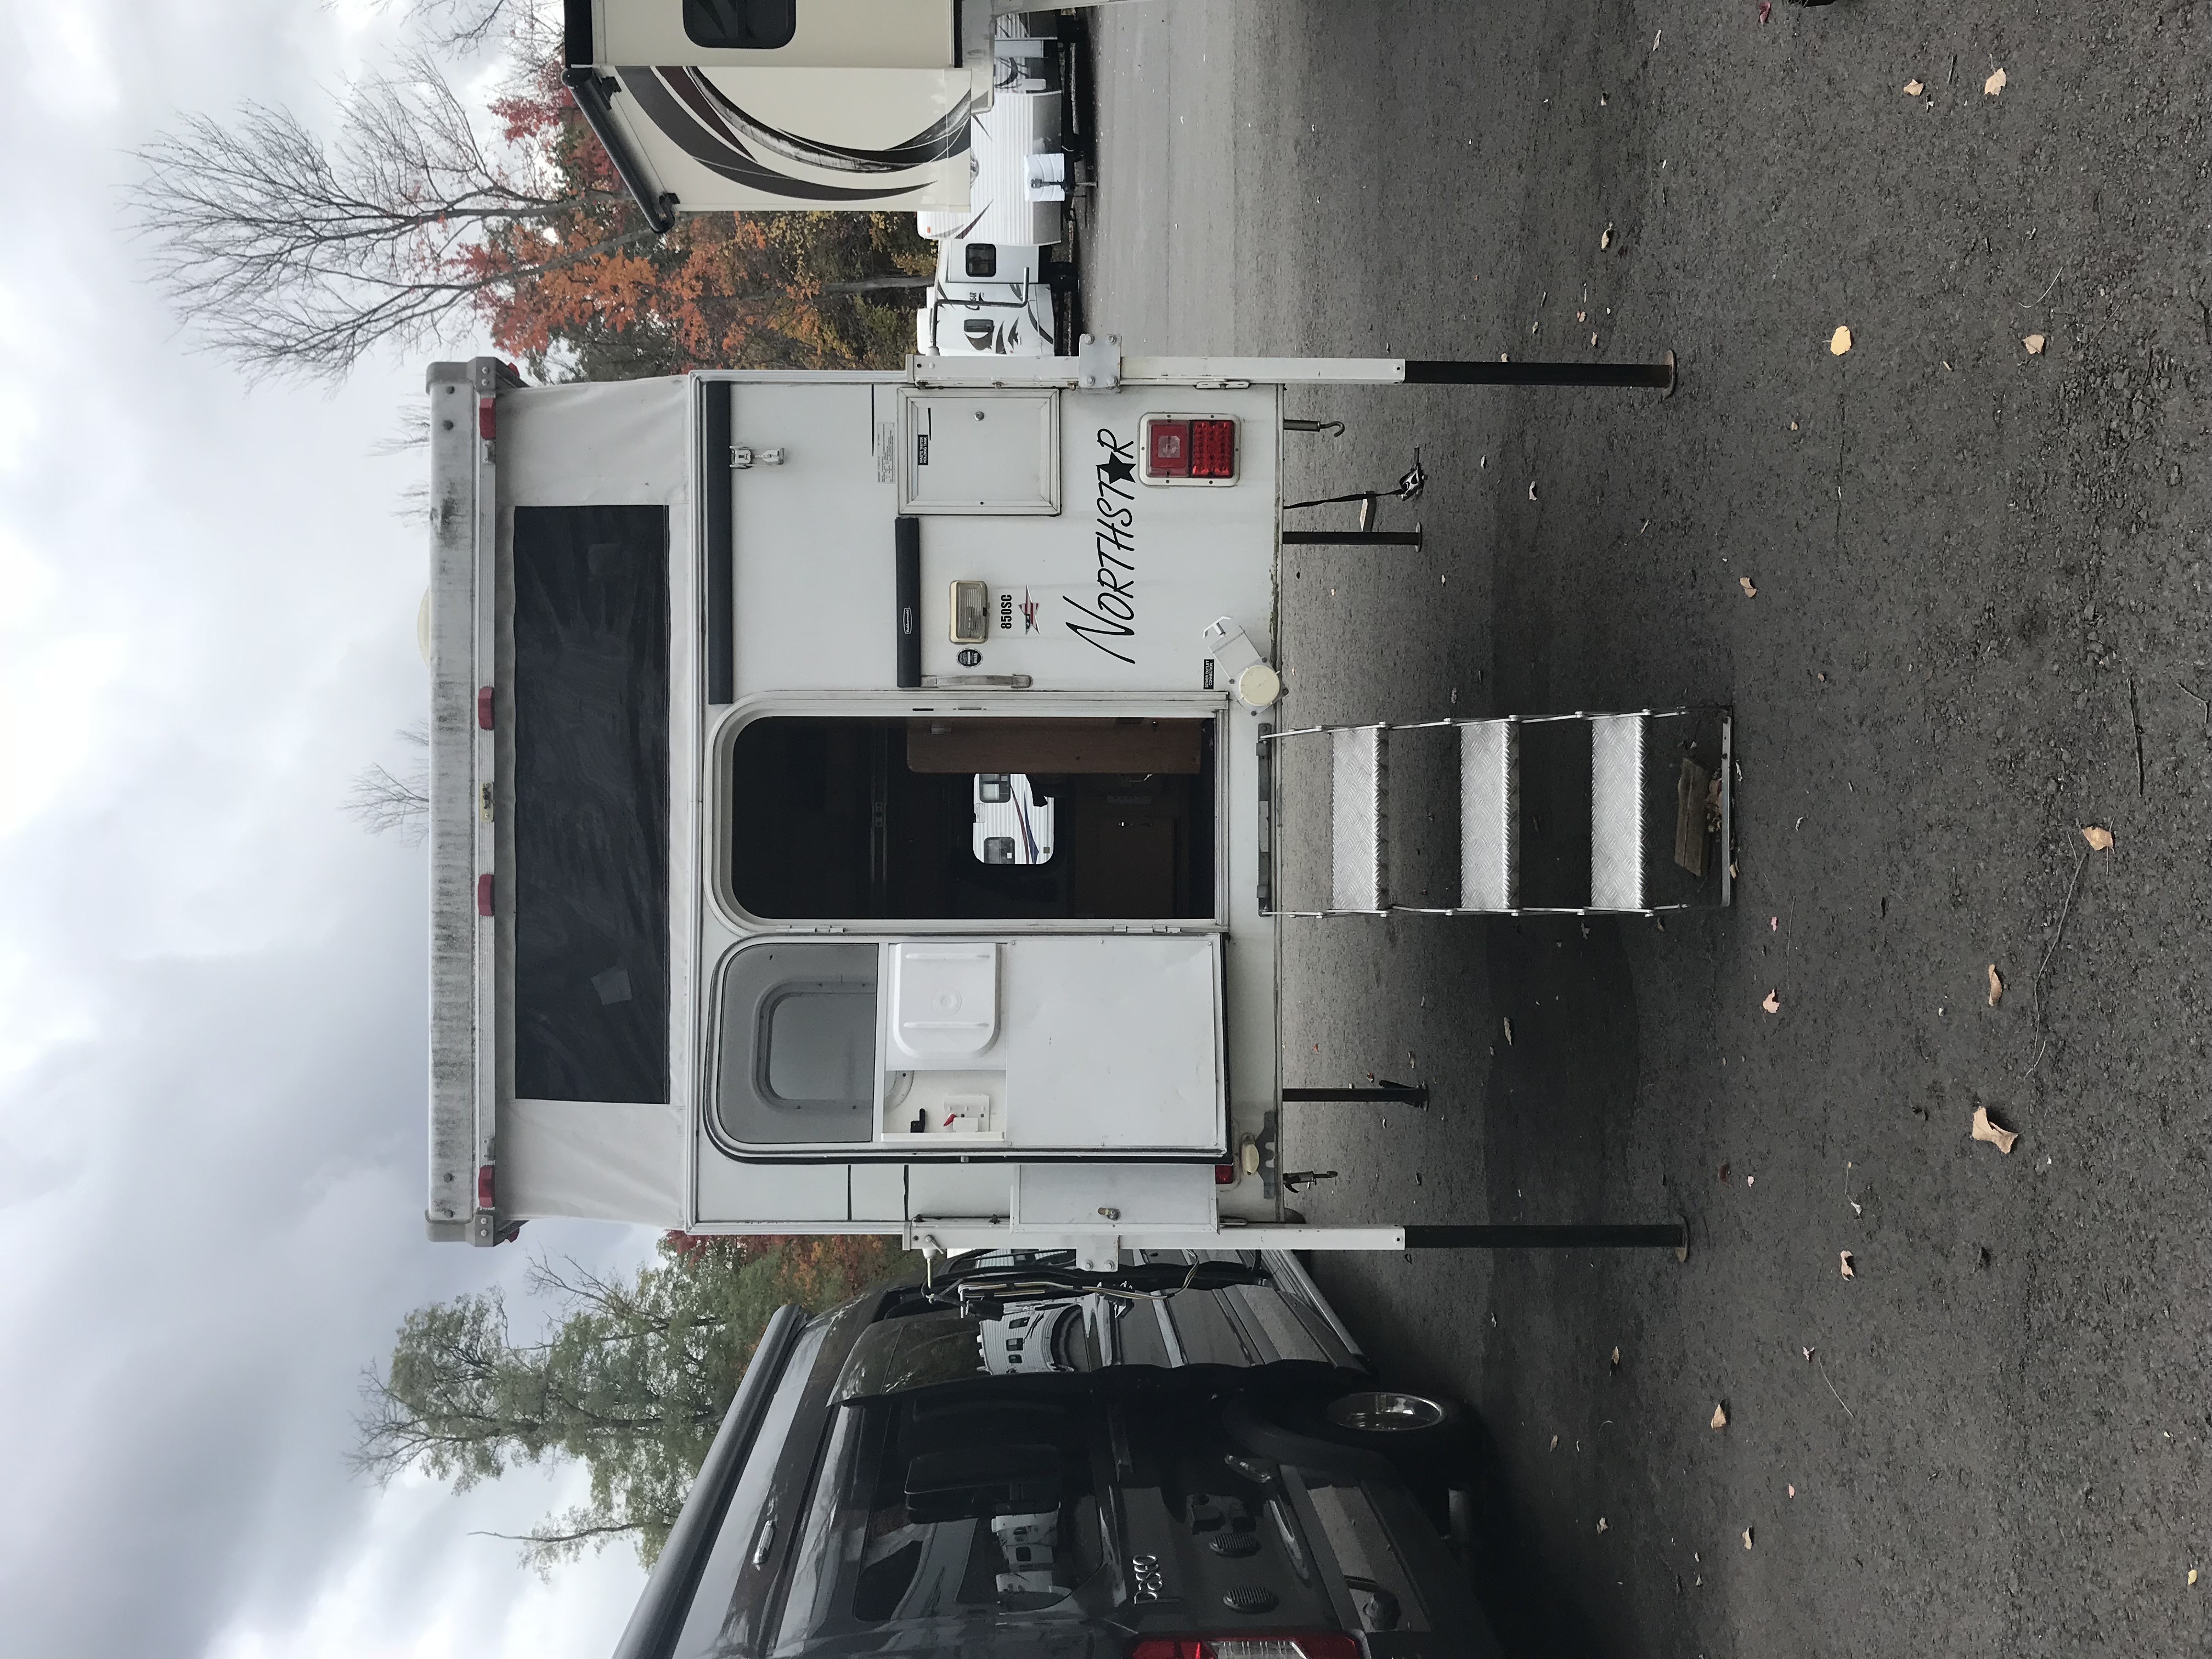 Northstar Truck Camper 850sc 2009